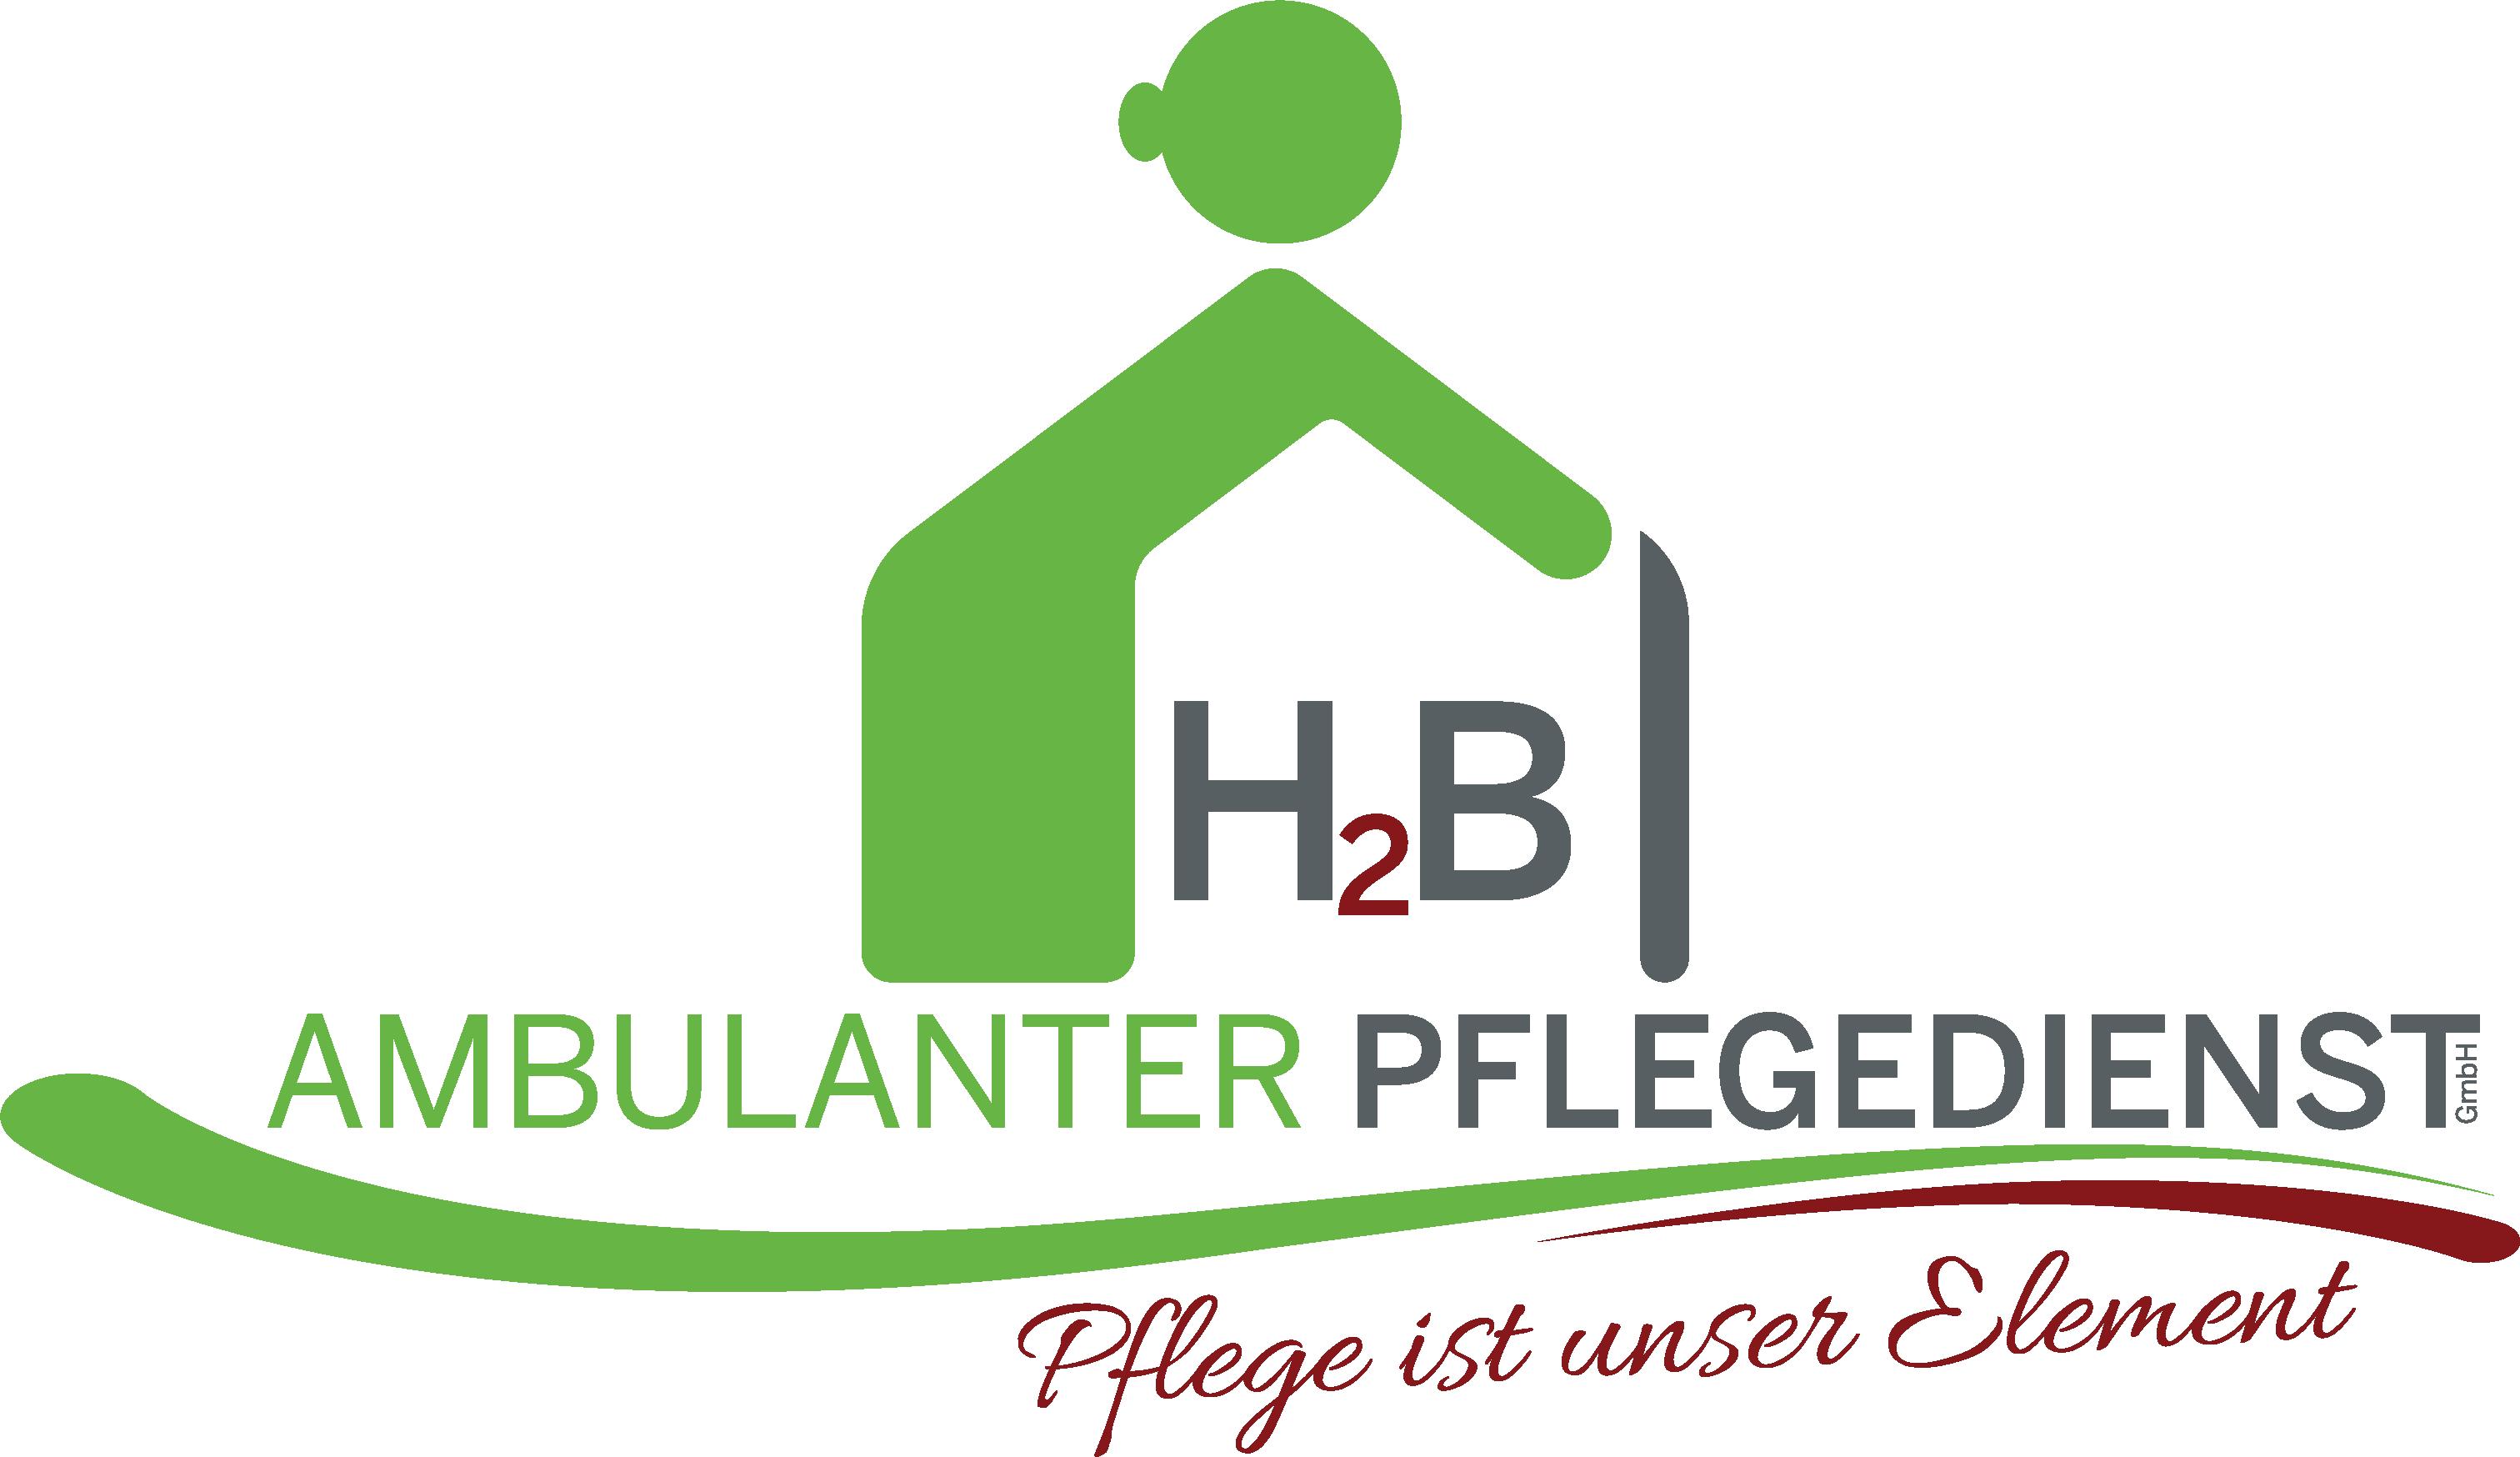 H2B Ambulanter Pflegedienst GmbH